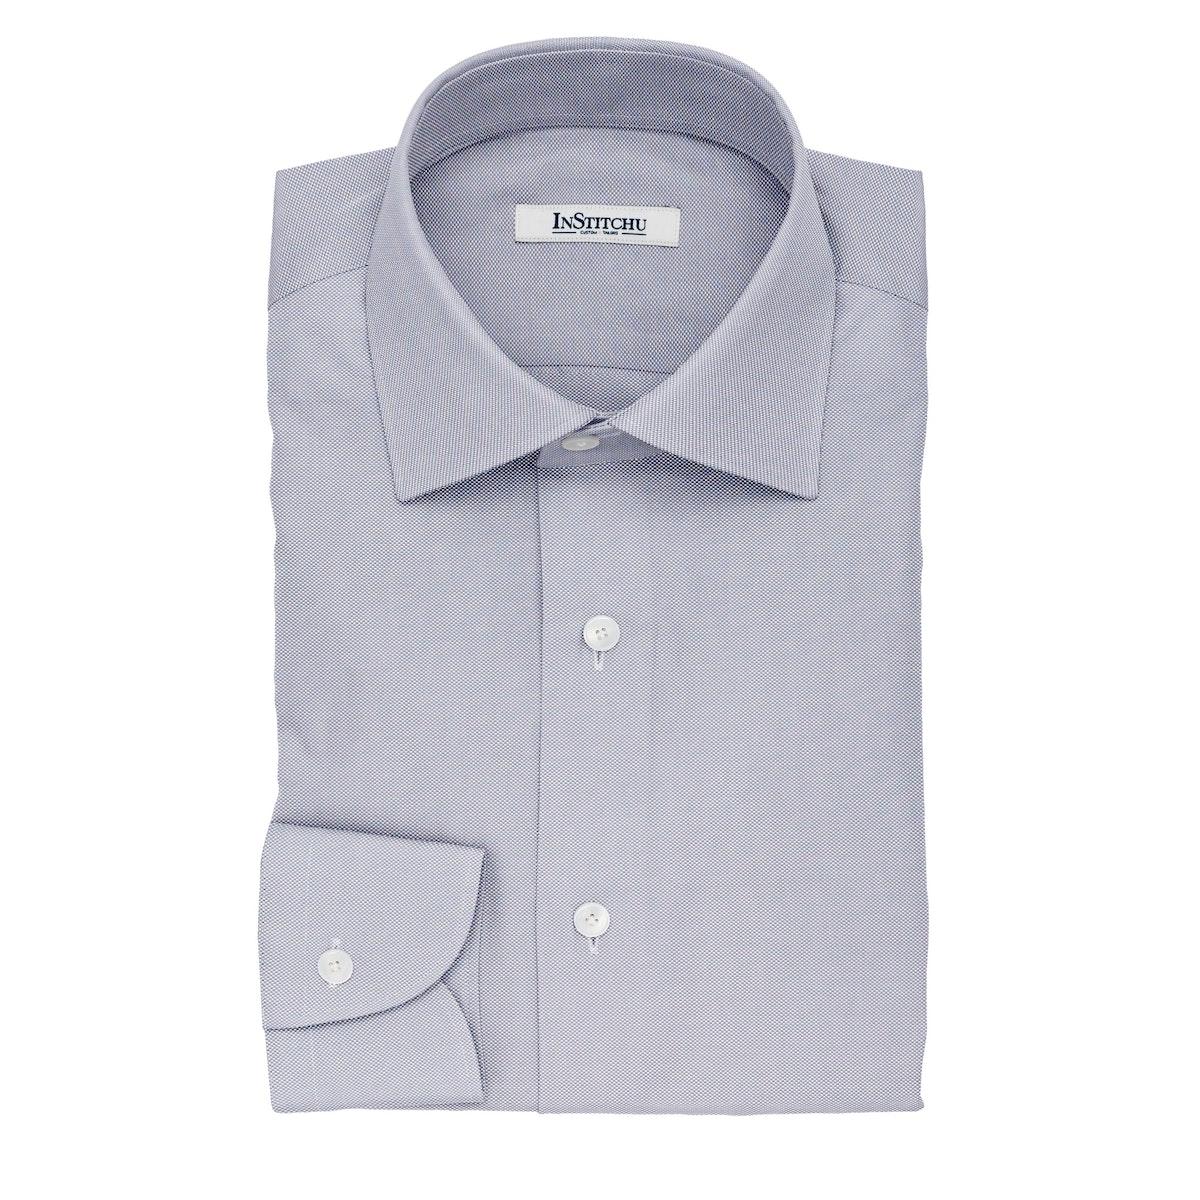 InStitchu Collection The Wilson Grey Pincheck Cotton Shirt